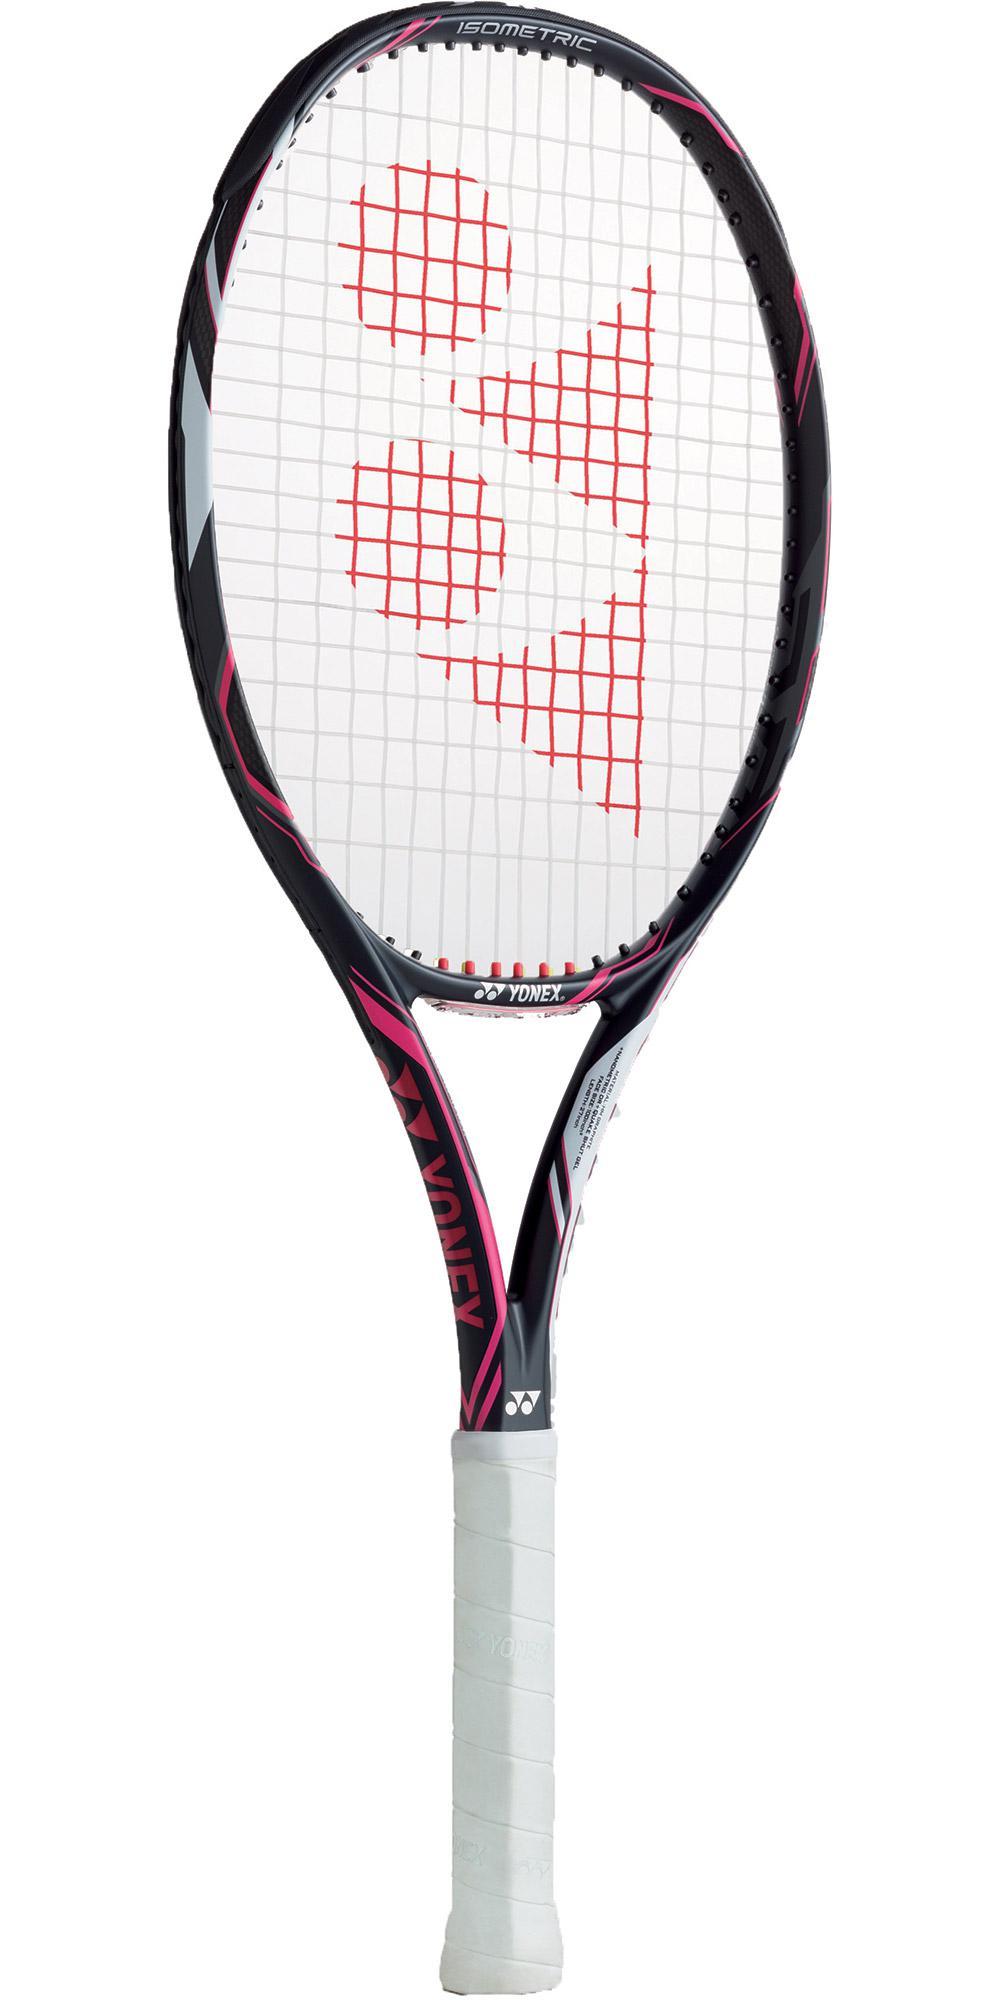 Yonex EZONE DR Lite Tennis Racket - Pink - Tennisnuts.com